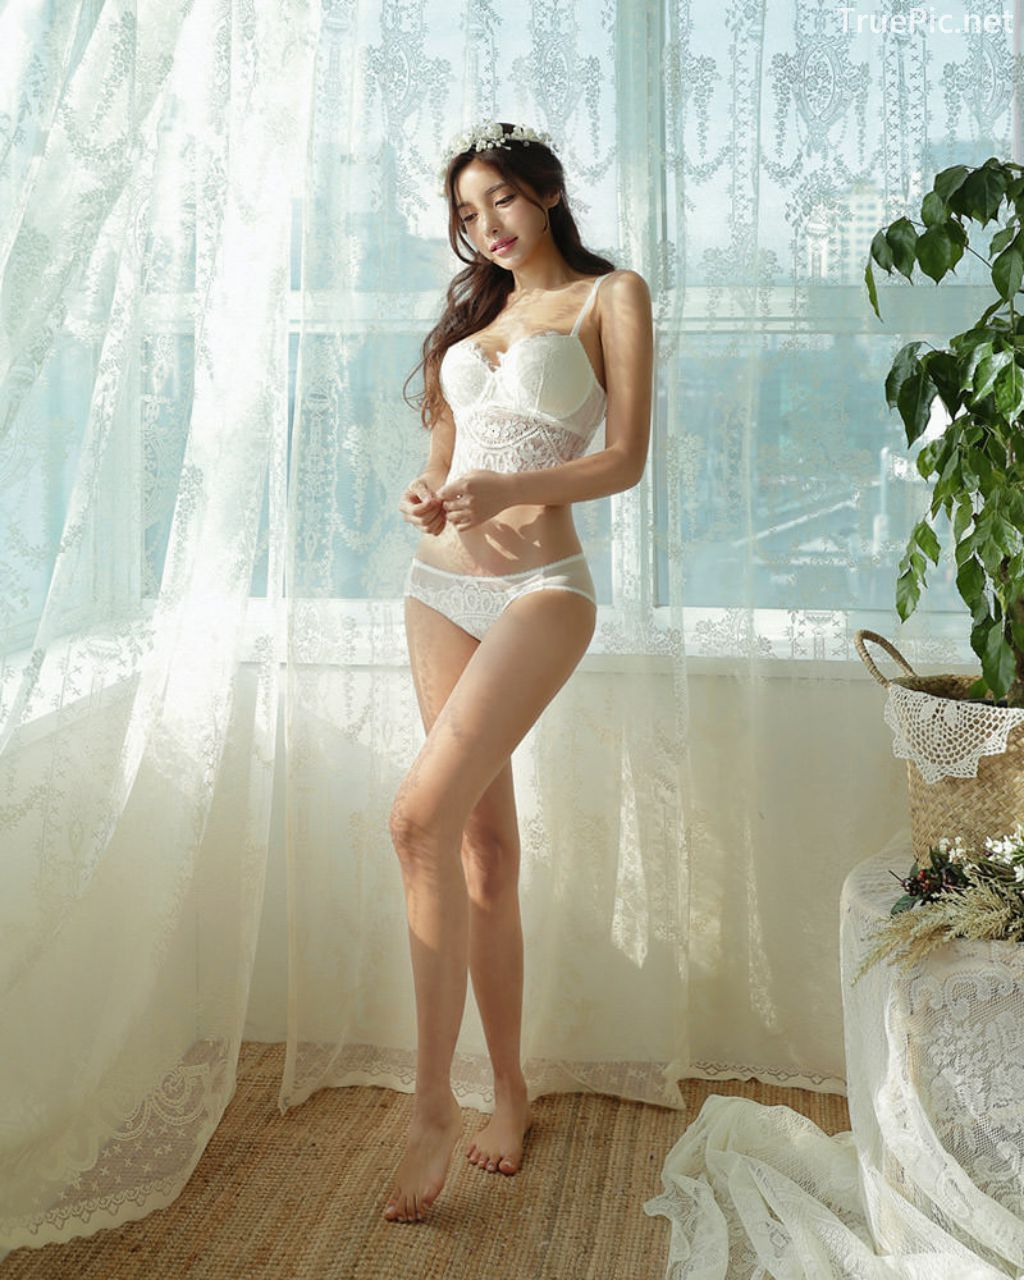 Korean Fashion Model - Jin Hee - Lovely Soft Lace Lingerie - TruePic.net - Picture 4